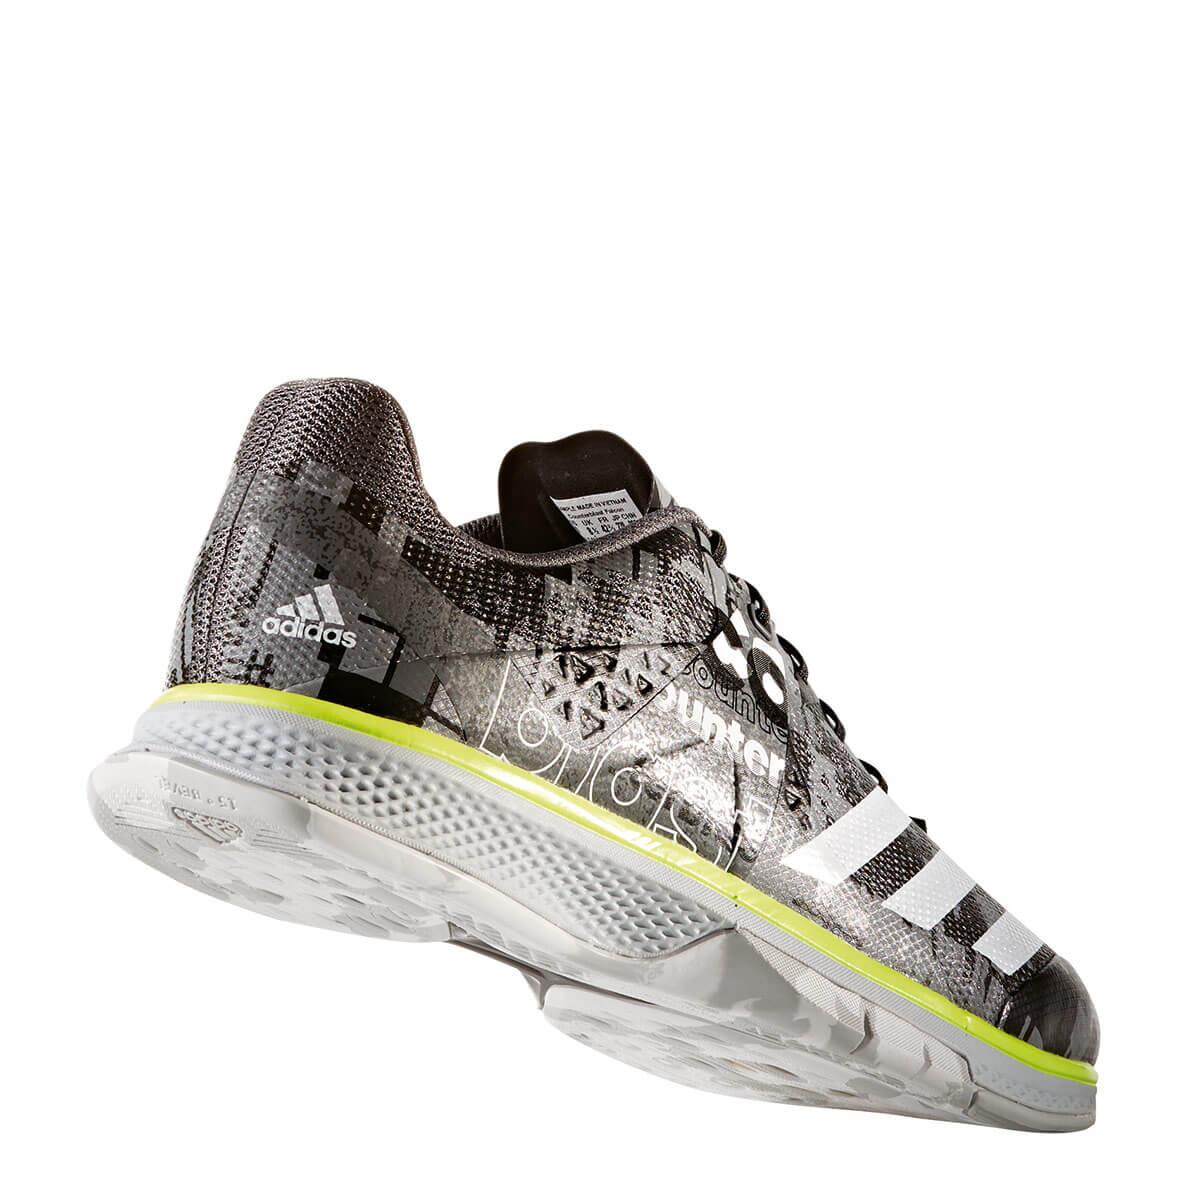 Adidas Adizero Counterblast 7 Handballschuhe - Black/Infrared